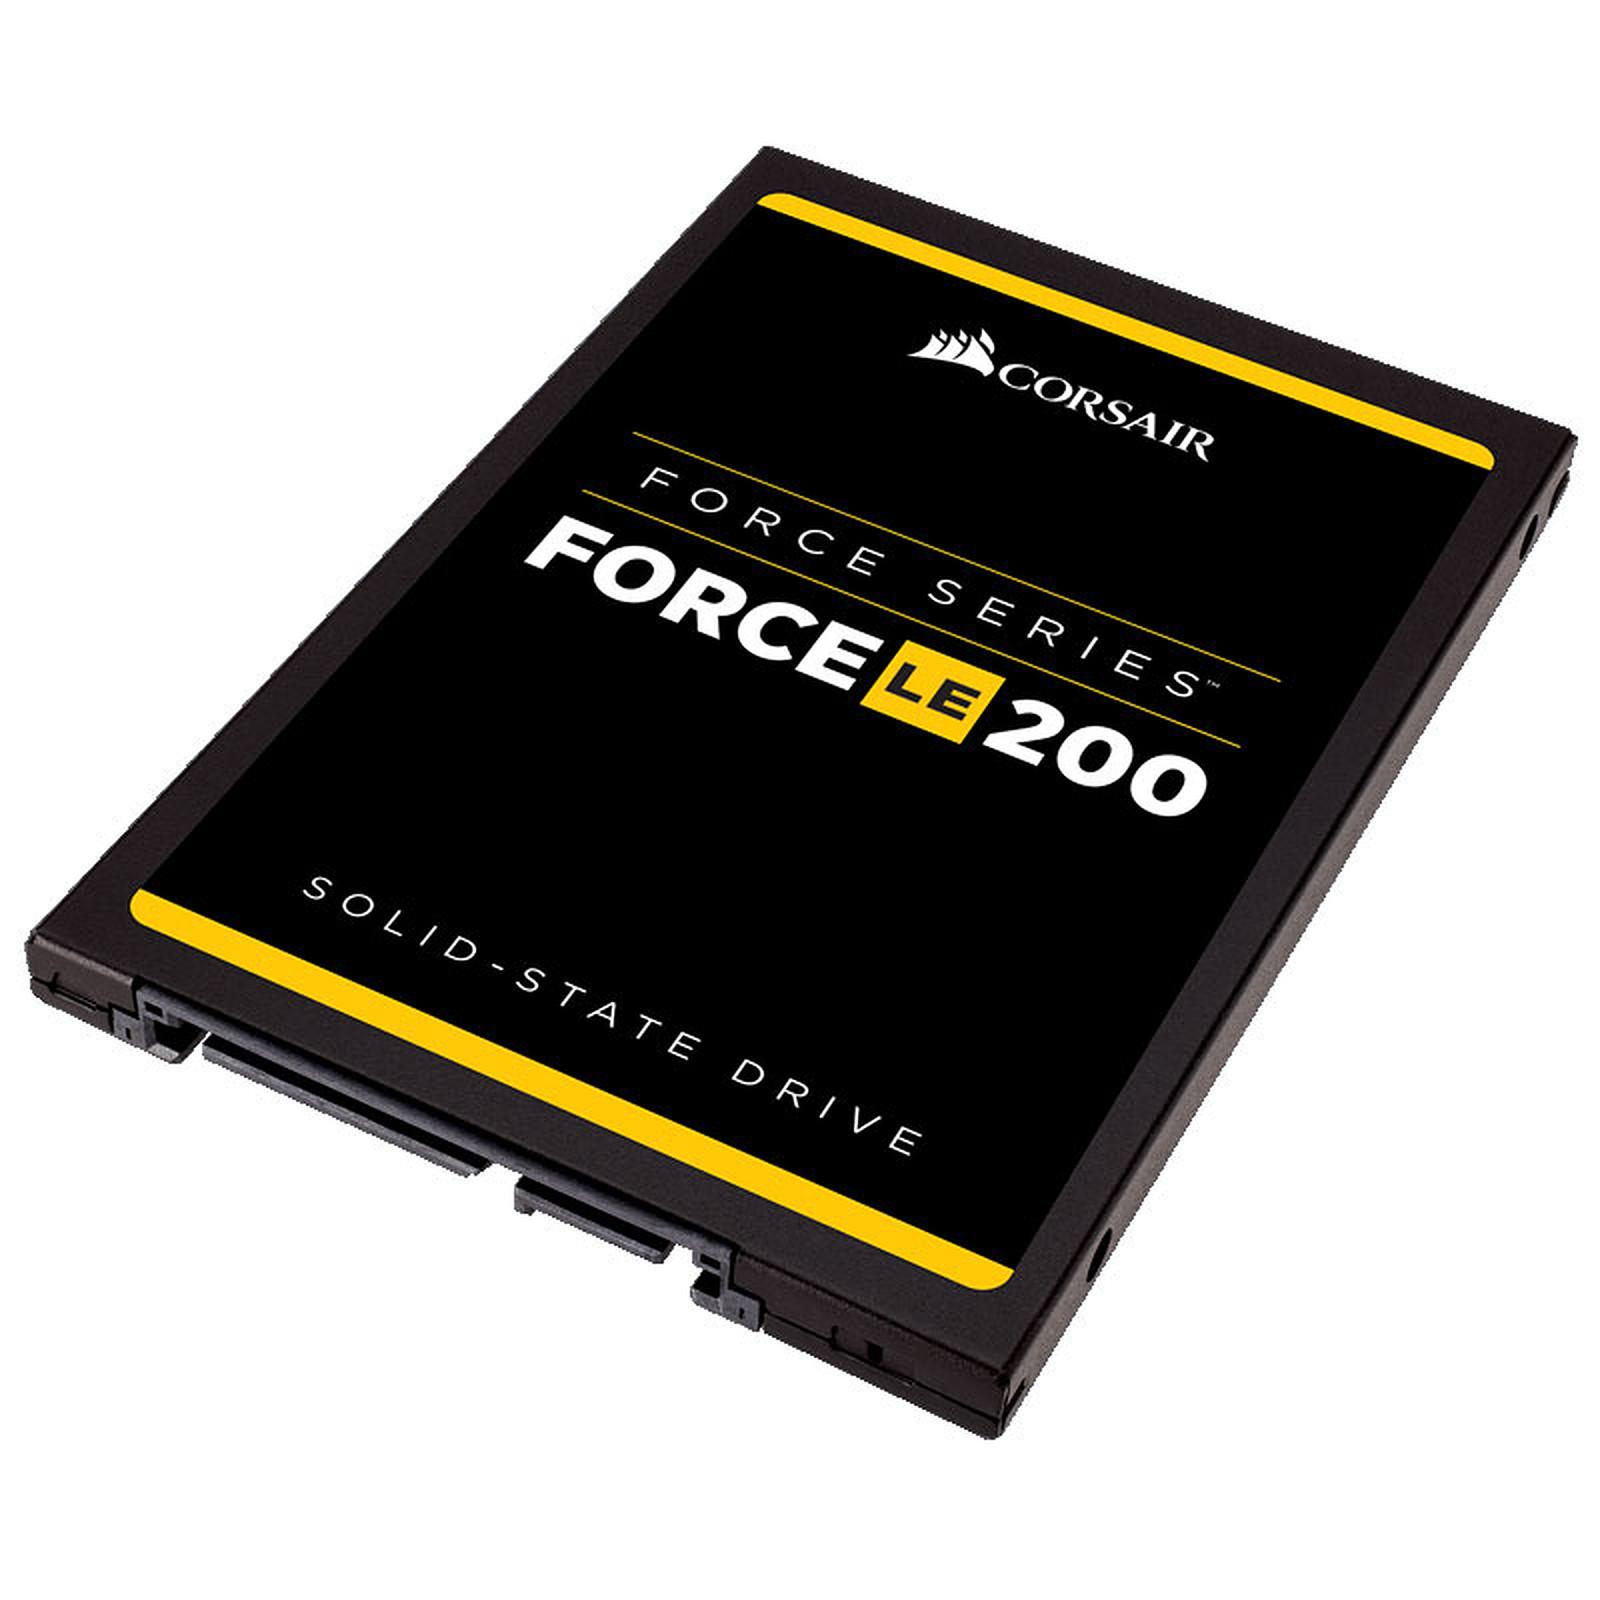 Corsair Force Series LE200 960 Go